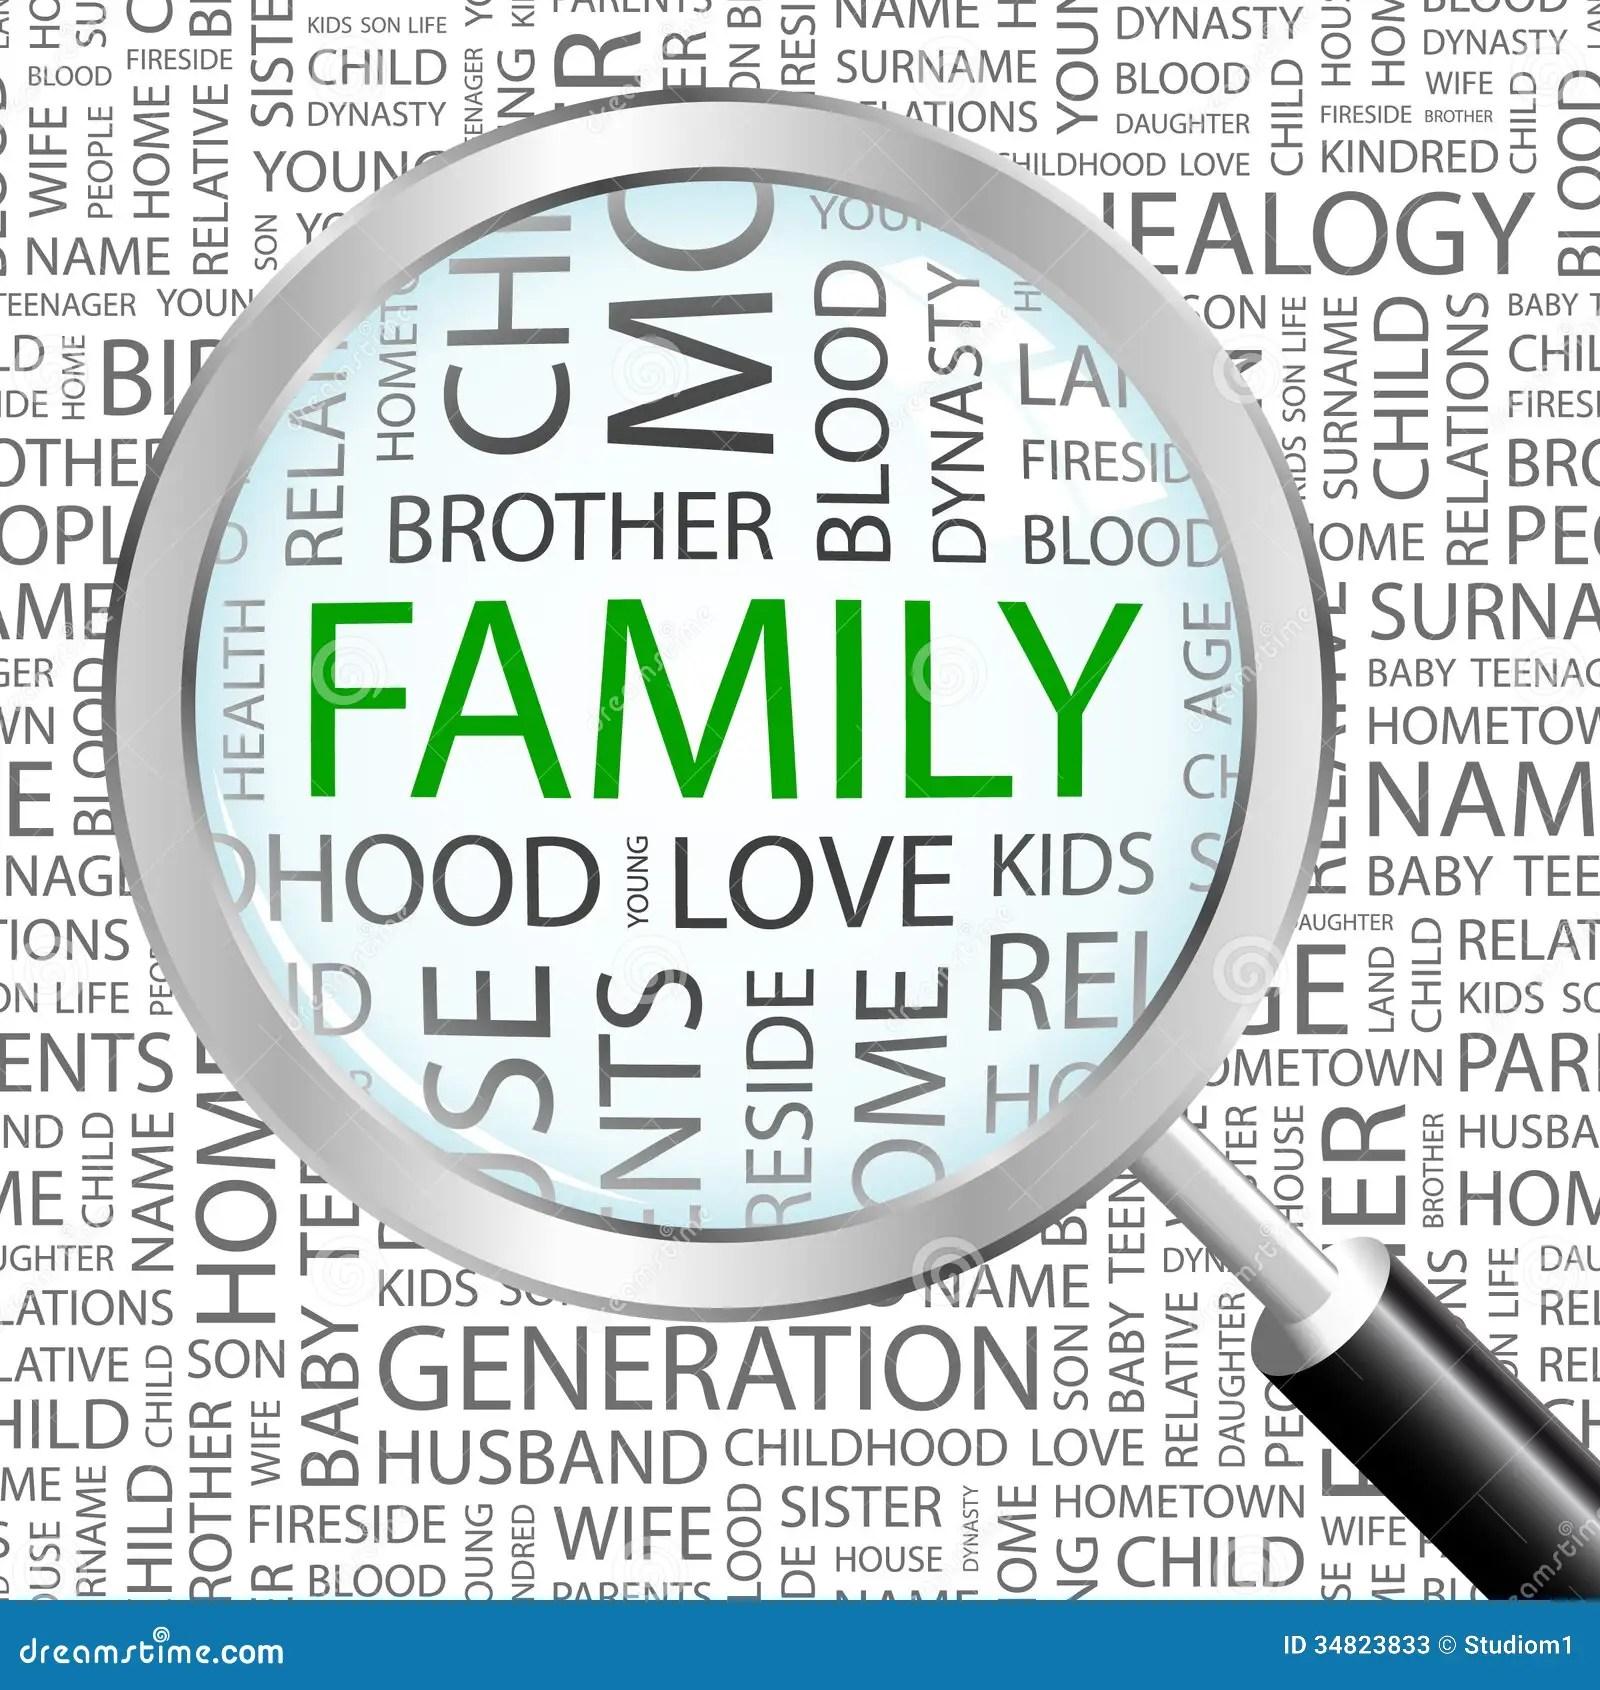 FAMILY Stock Photos Image 34823833